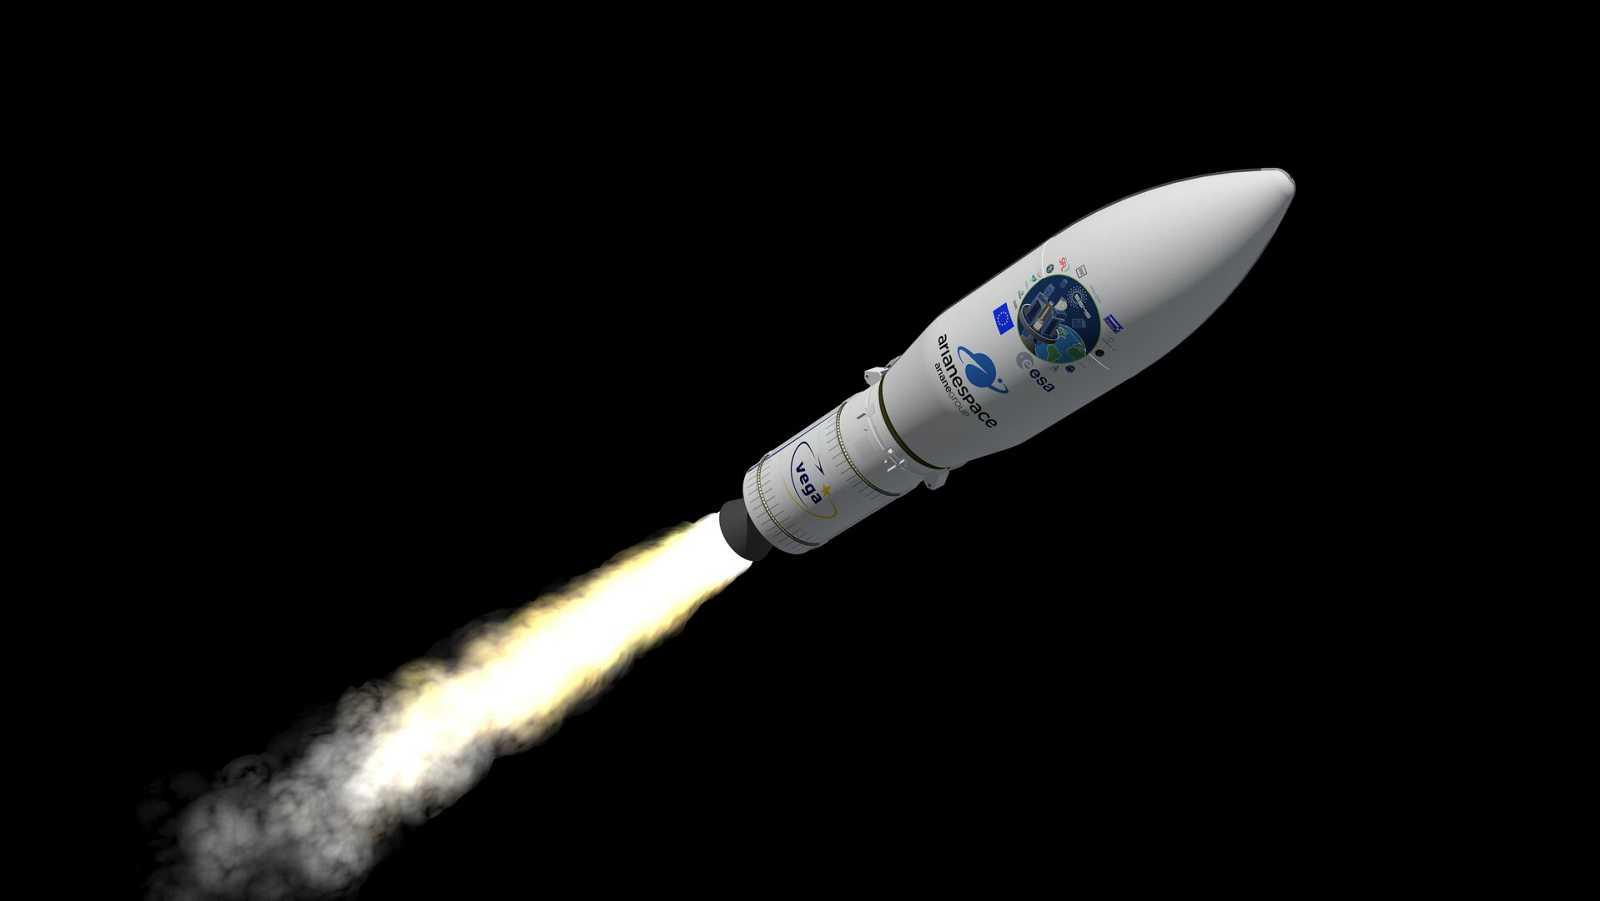 A golpe de bit - Vega: un hito con la ESA - 14/09/20 - escuchar ahora